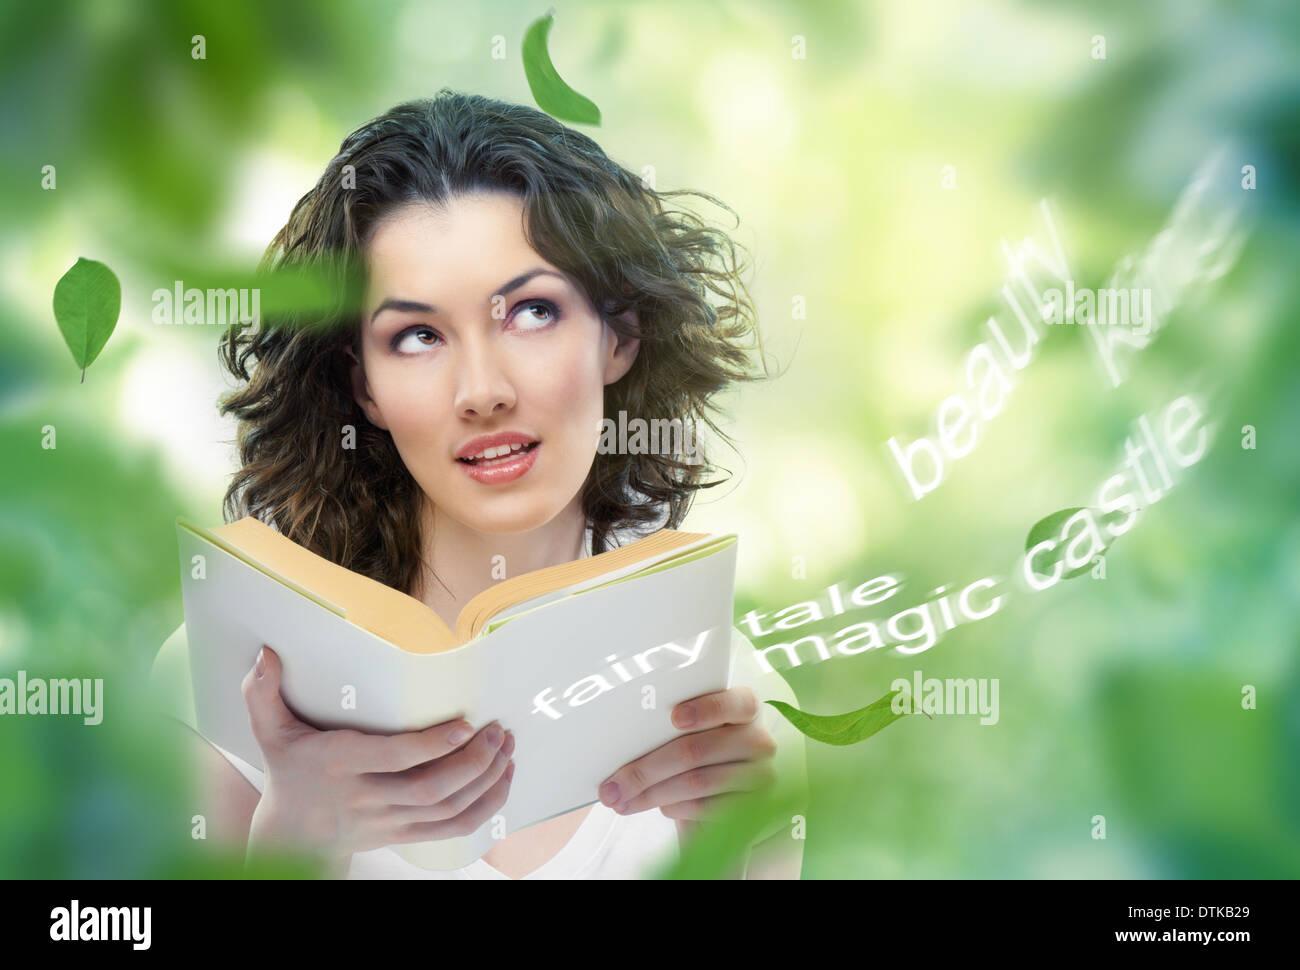 young beautiful girl reading a magic book - Stock Image